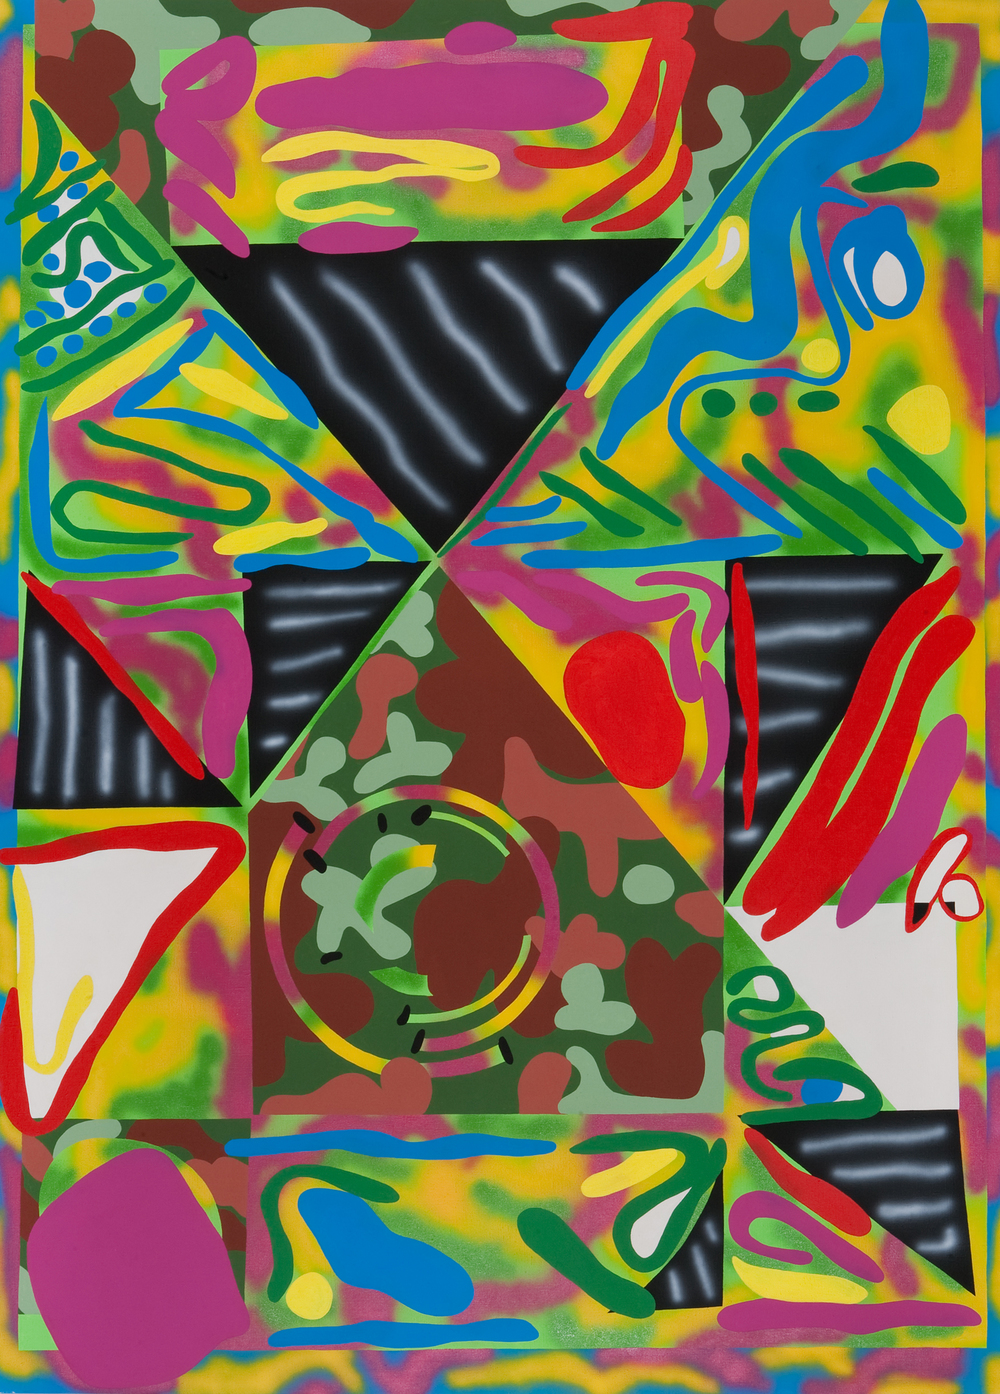 Friends of lunapark, 2009, acrylic, spray on canvas, 250 x 180 cm